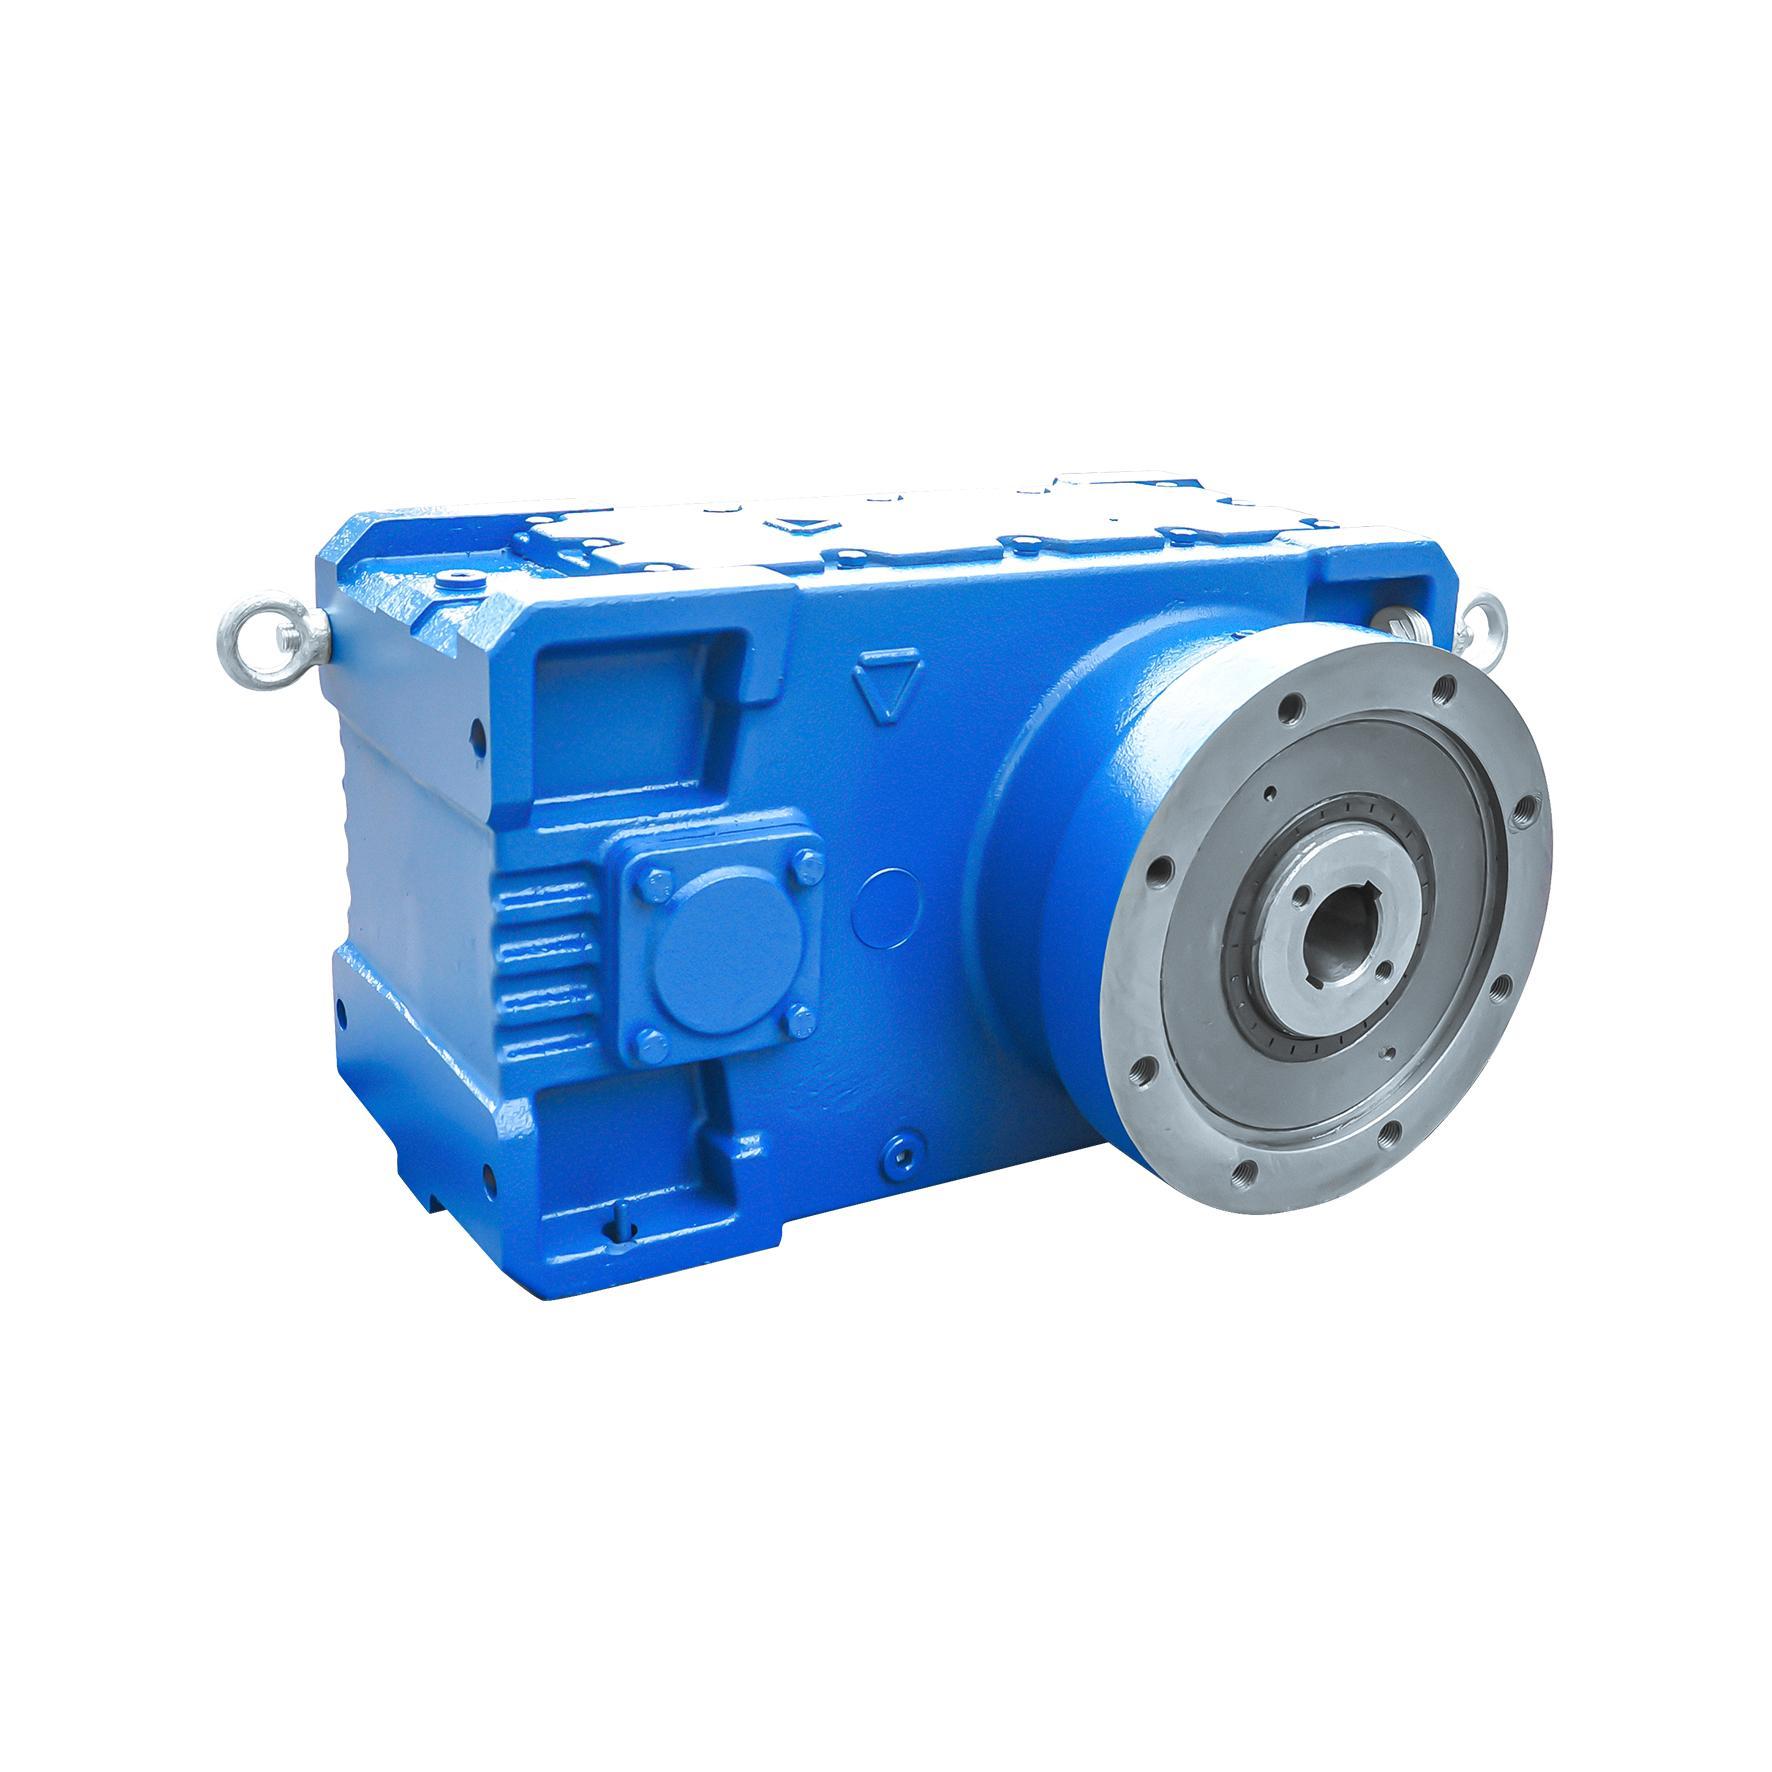 REDSUN ZLYJ series helical gearbox for plastic single screw machinery